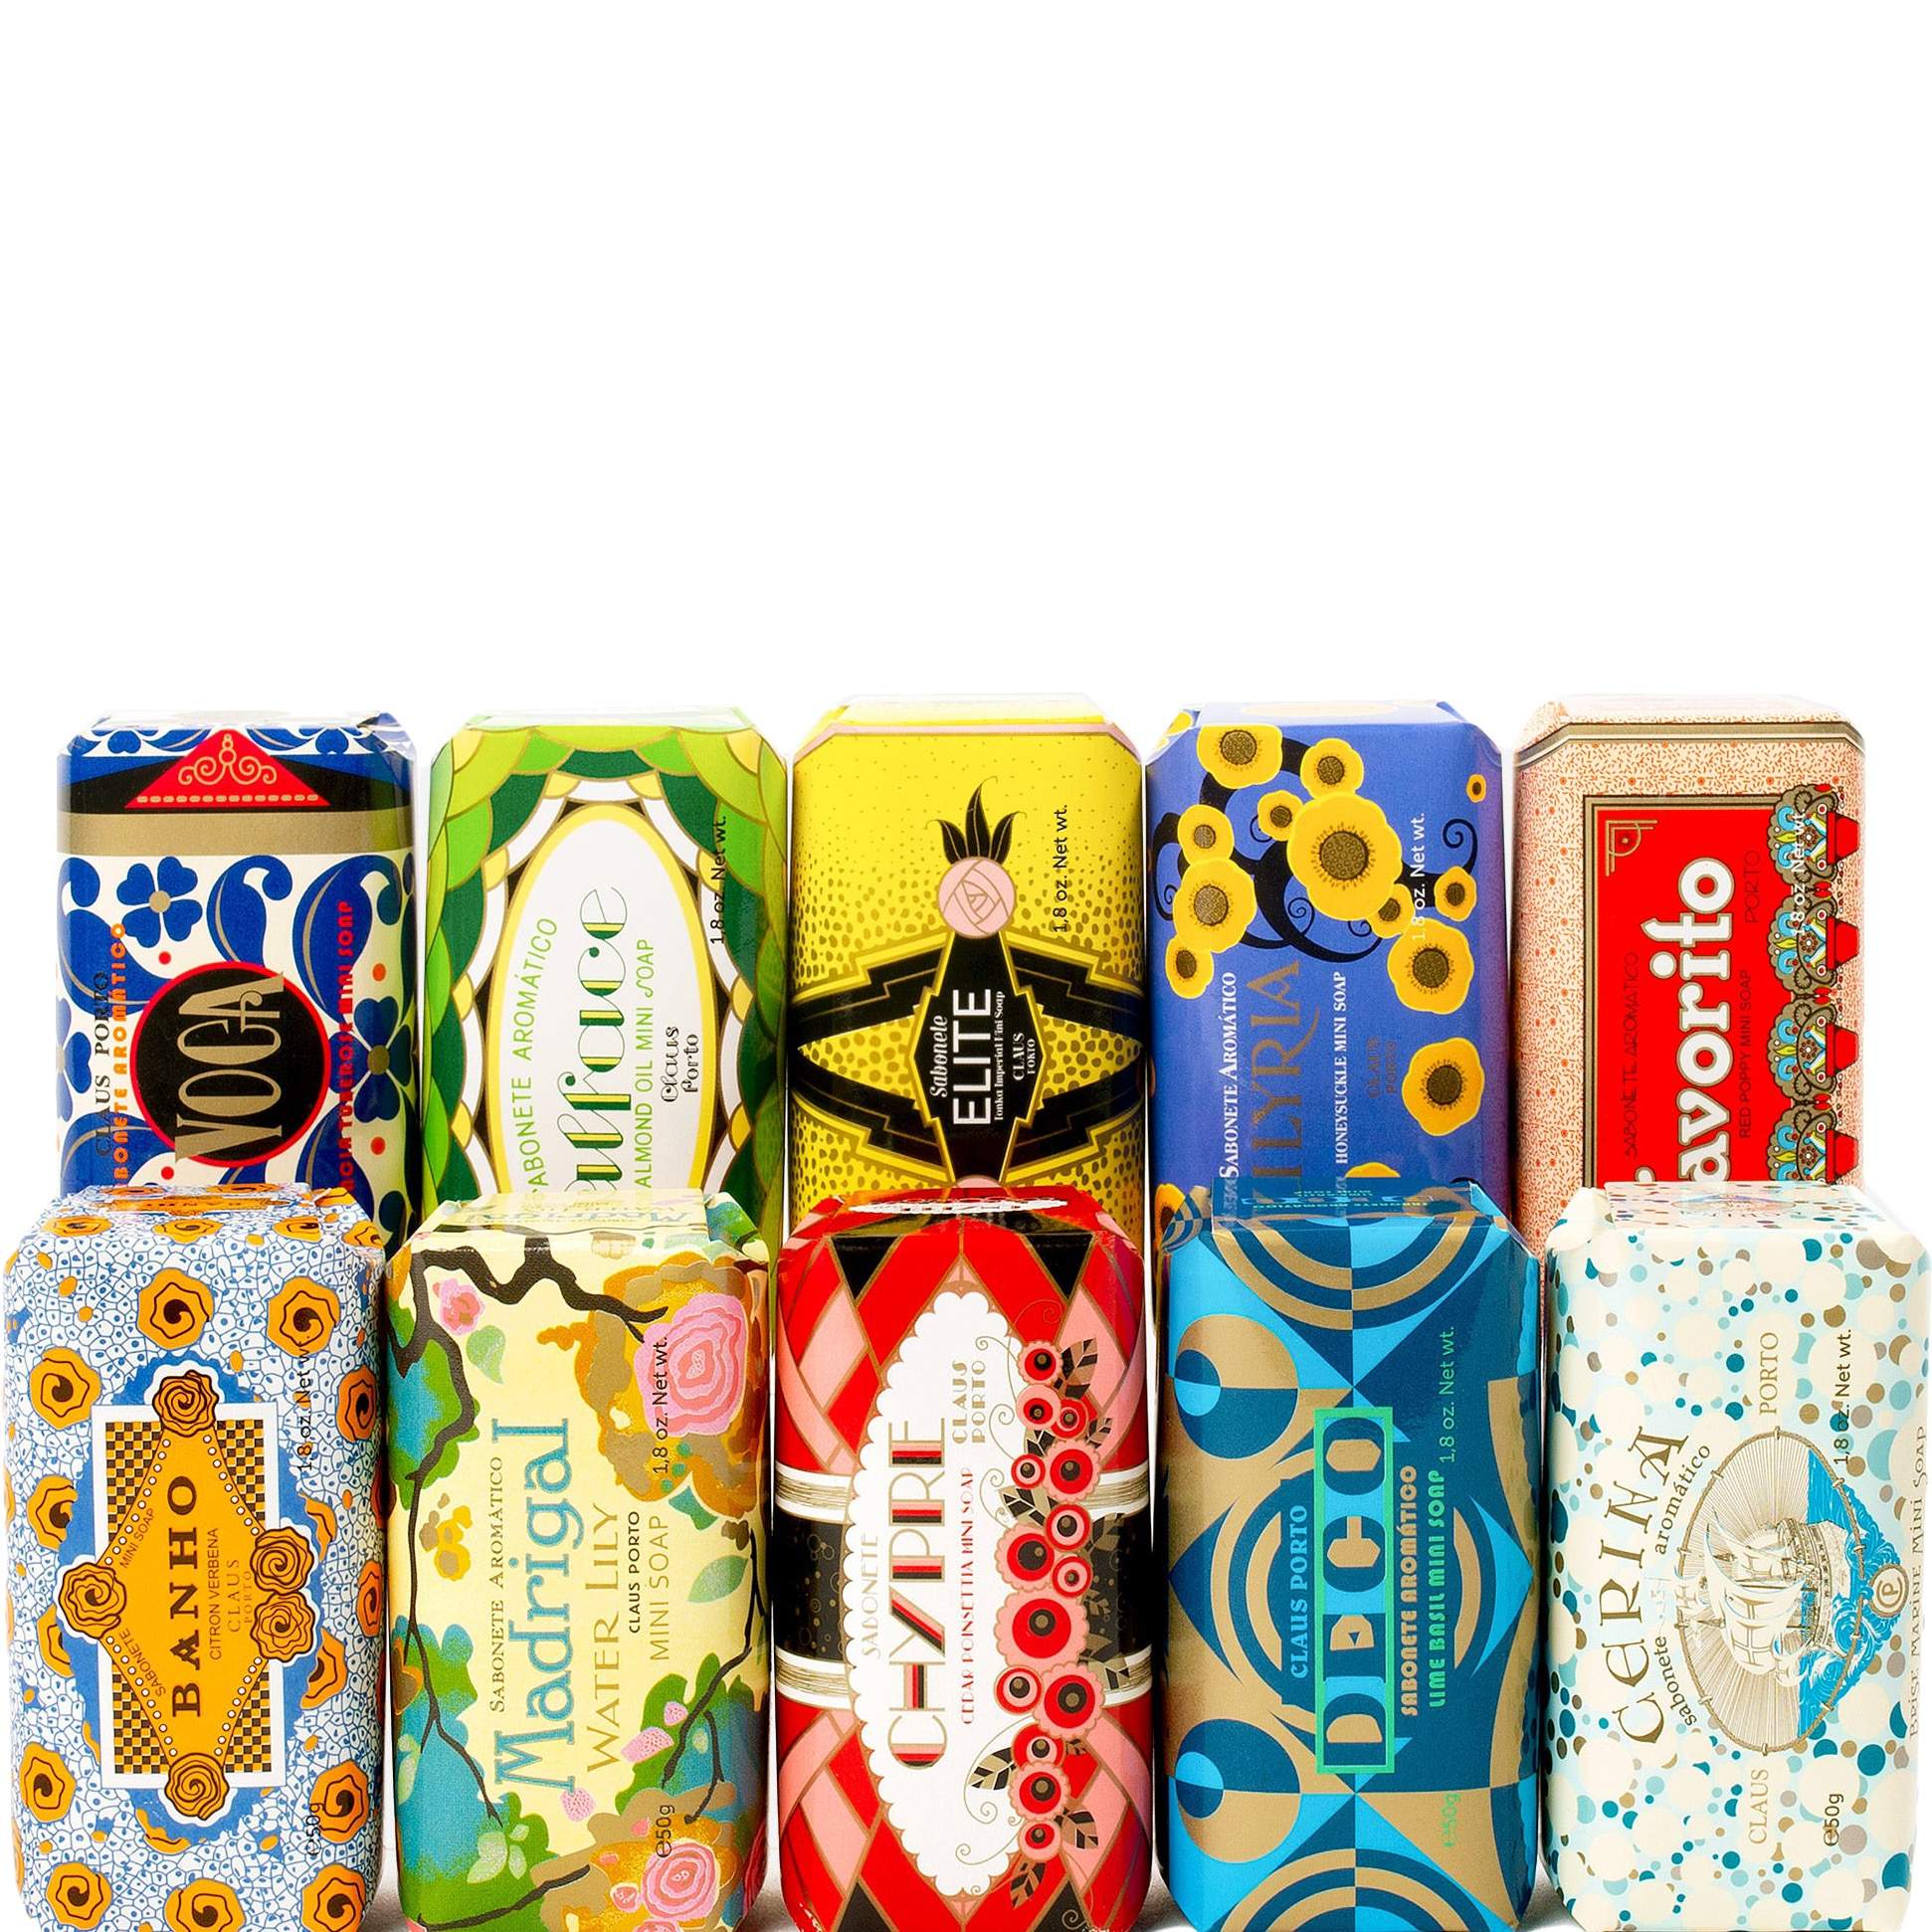 Mini Soap Alface / Almond Oil